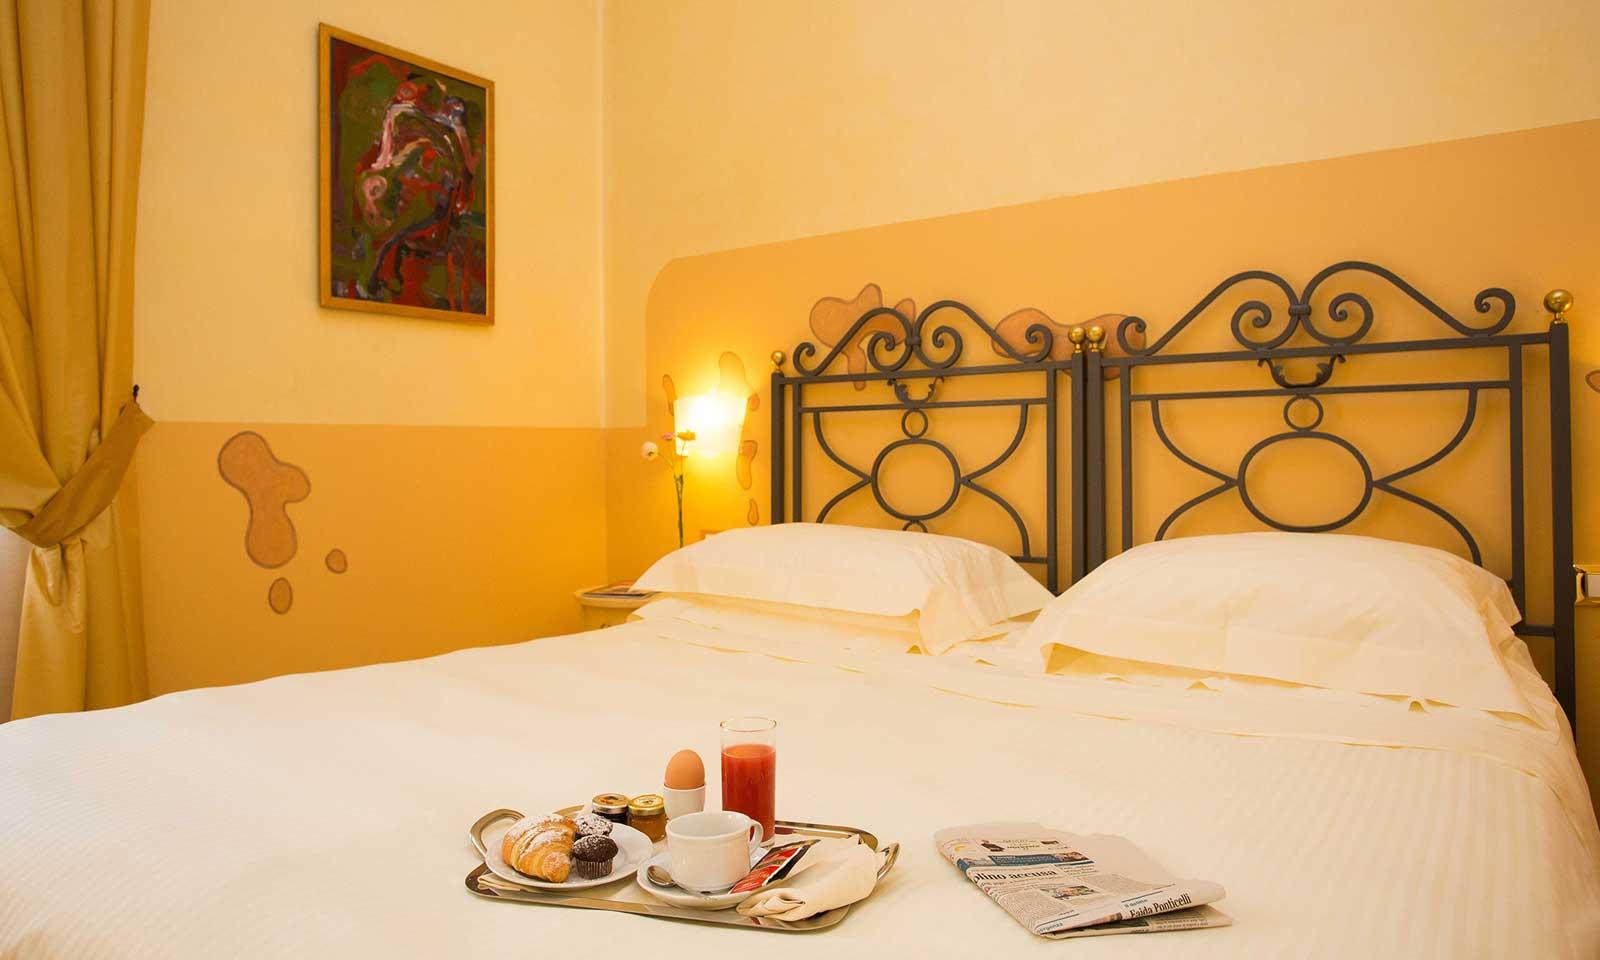 Chambre classique Costantinopoli 104 hotel de charme à Naples, Italie